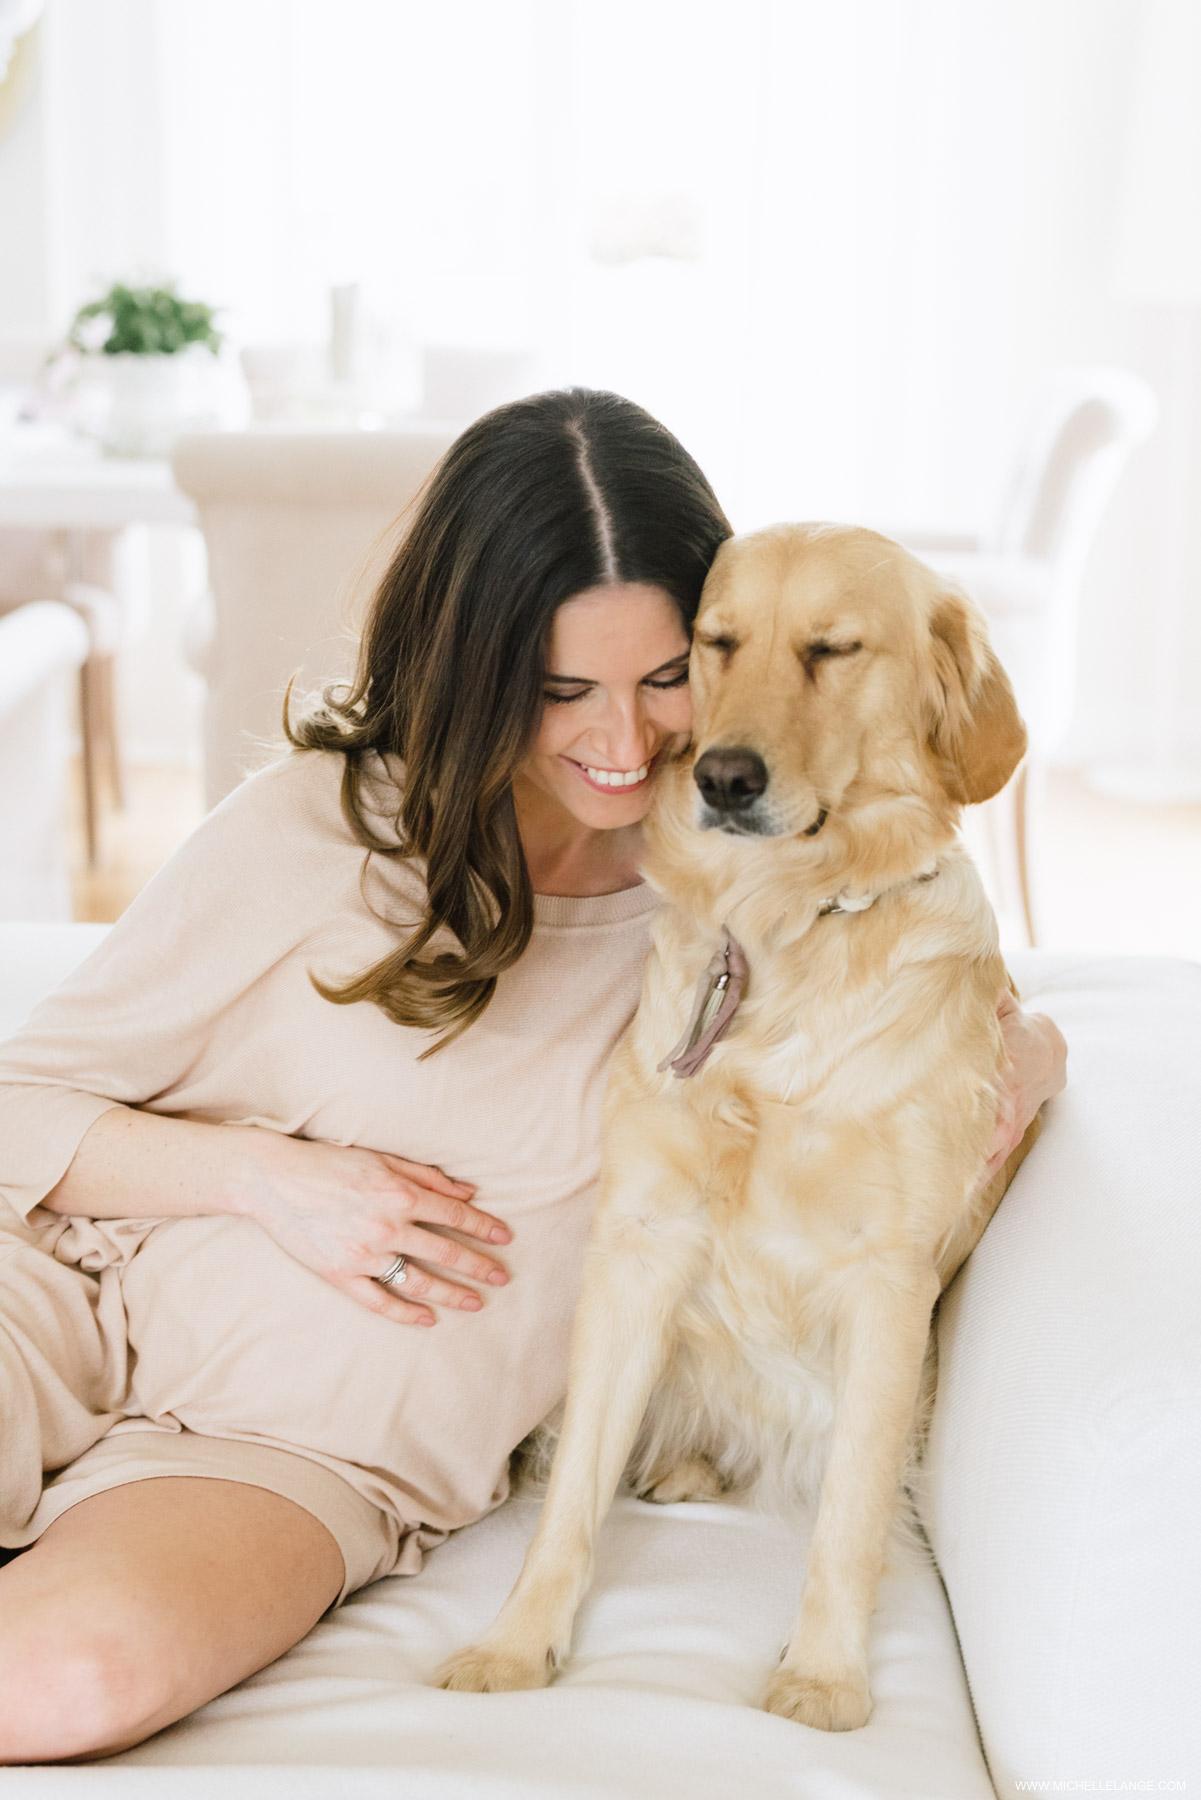 NJ and NYC Maternity and Newborn Photographer